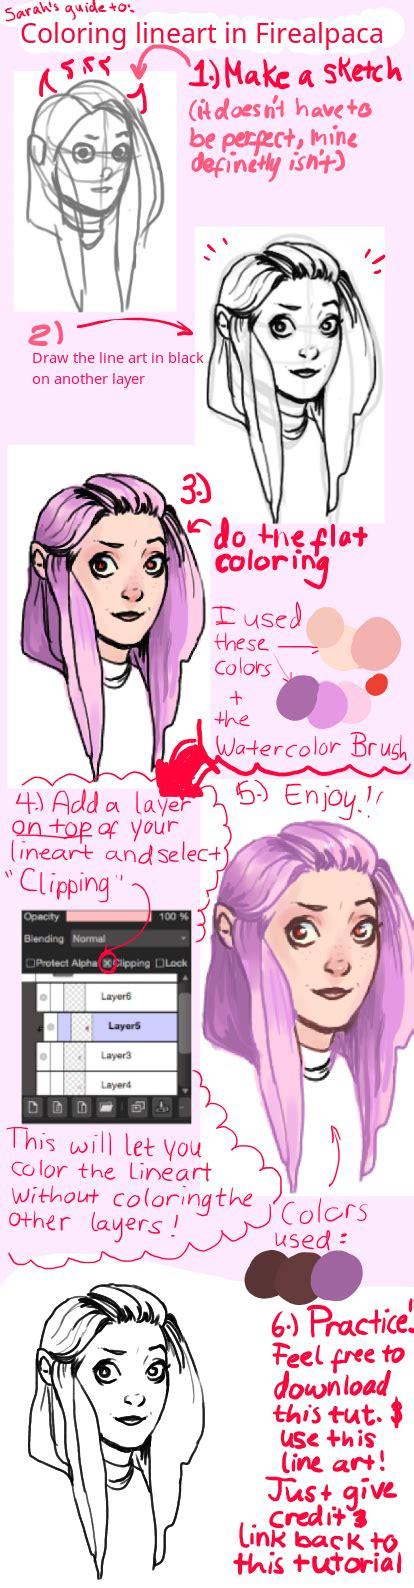 firealpaca lineart coloring tutorial base